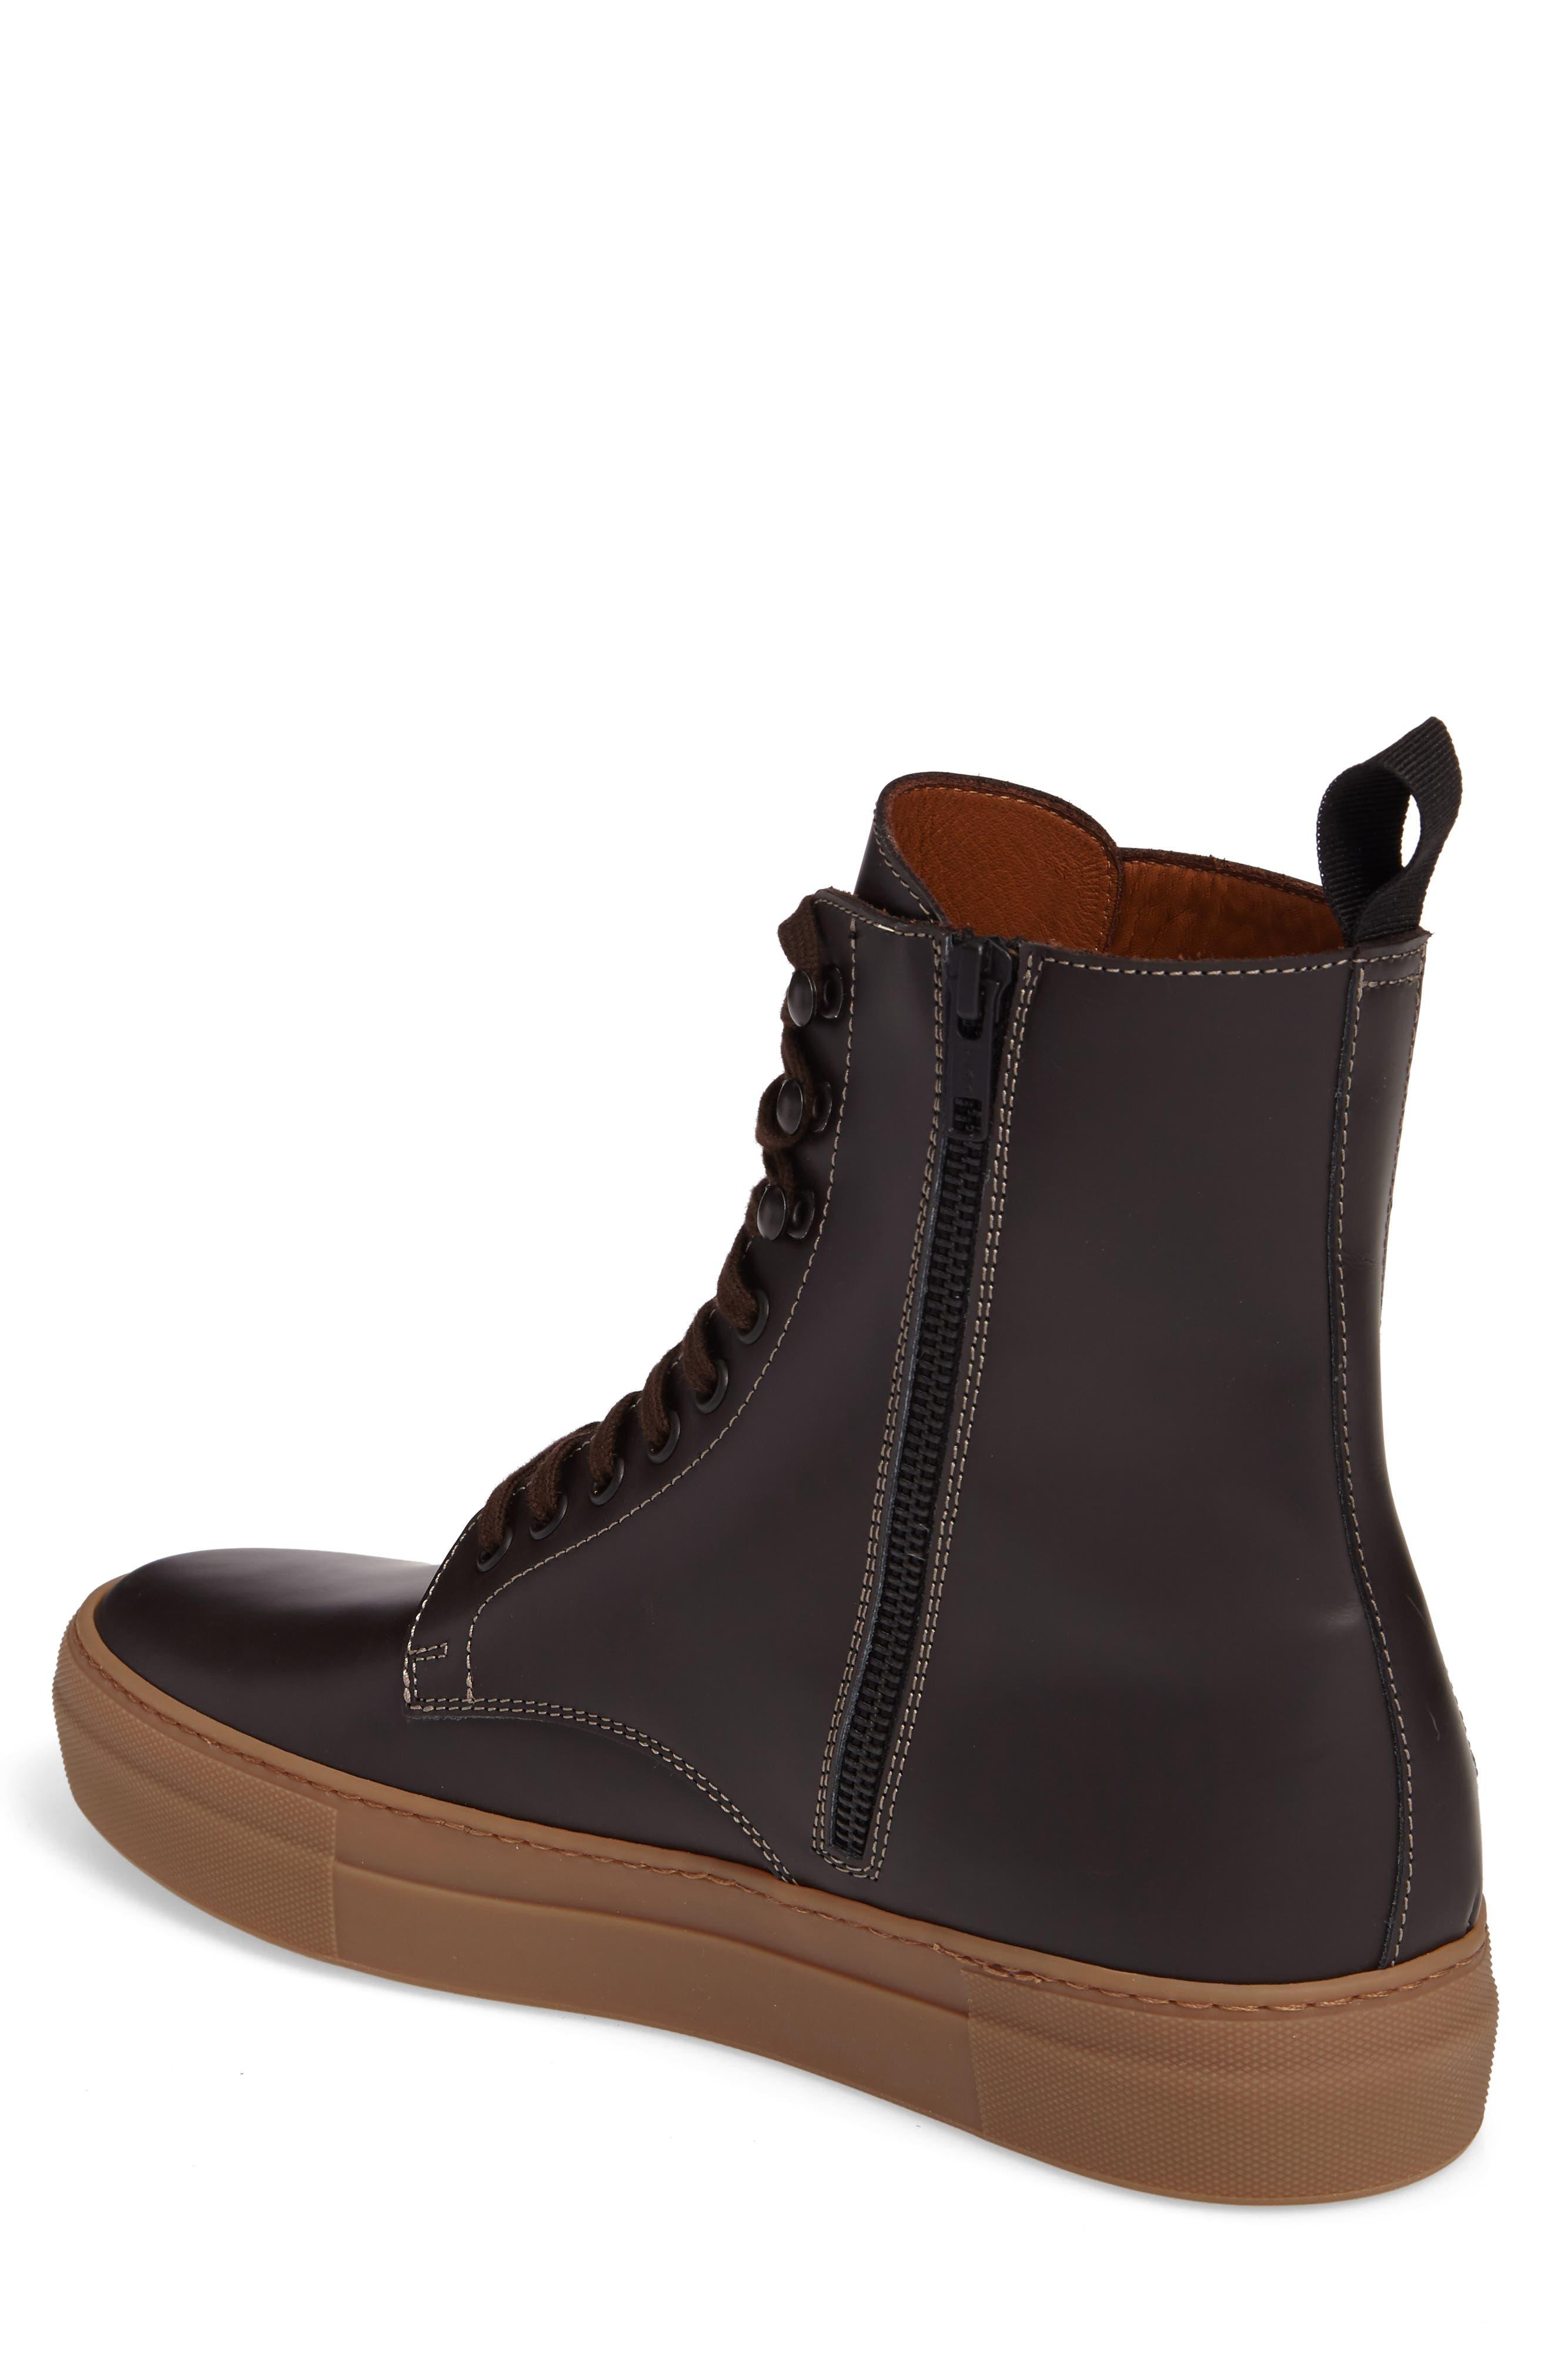 Alternate Image 2  - Common Projects x Robert Geller Plain Toe Boot (Men)